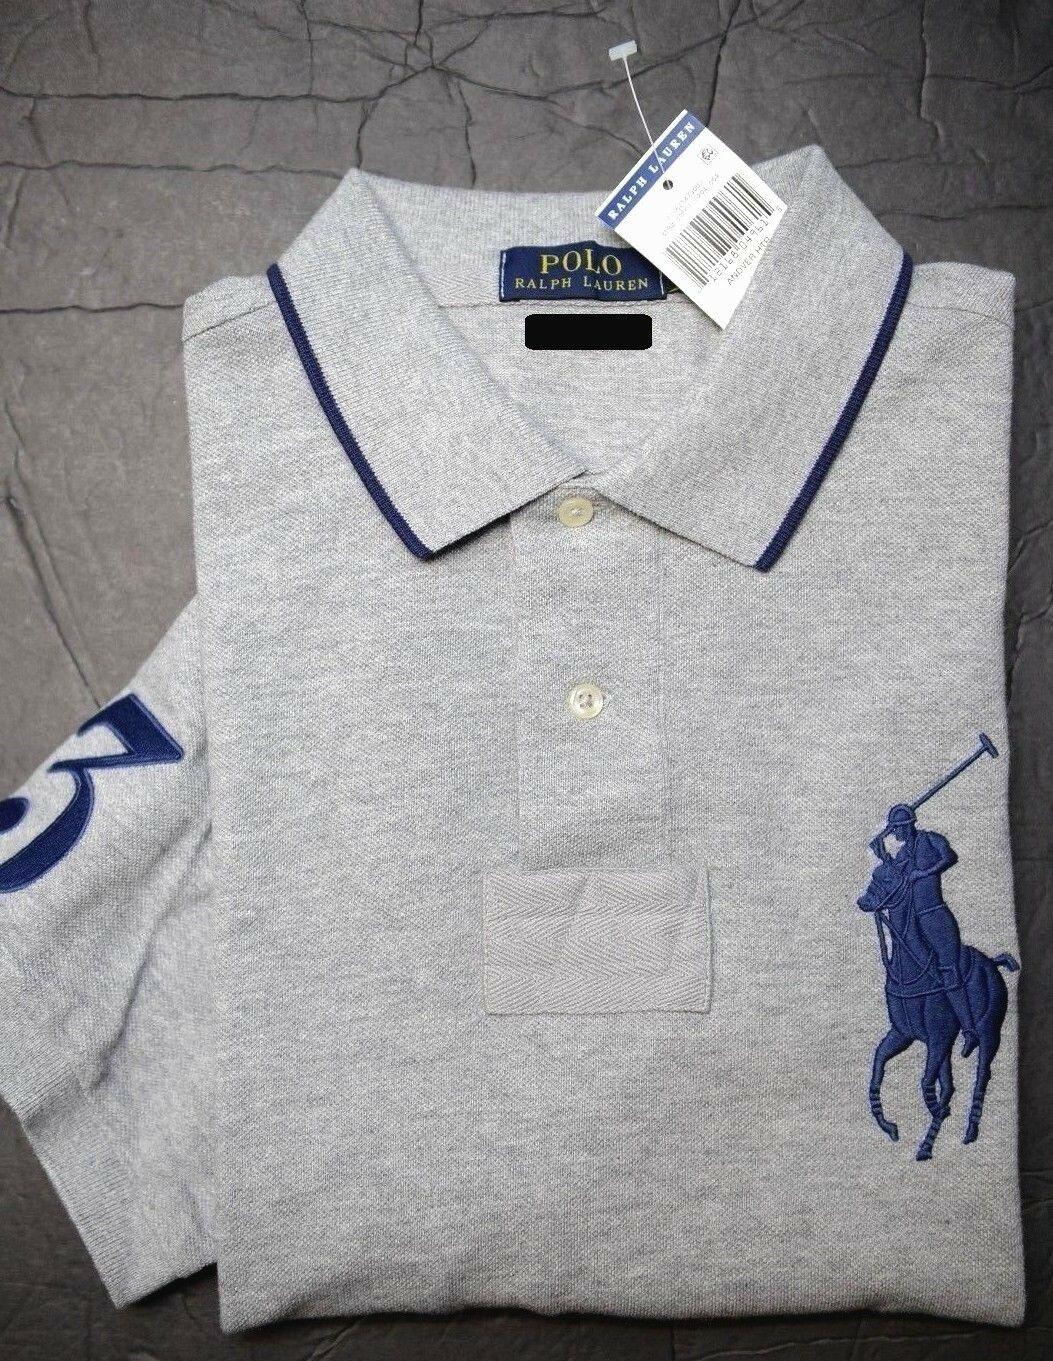 Polo Ralph Lauren long sleeve big pony #3 shirt yellow green blue white S M L XL